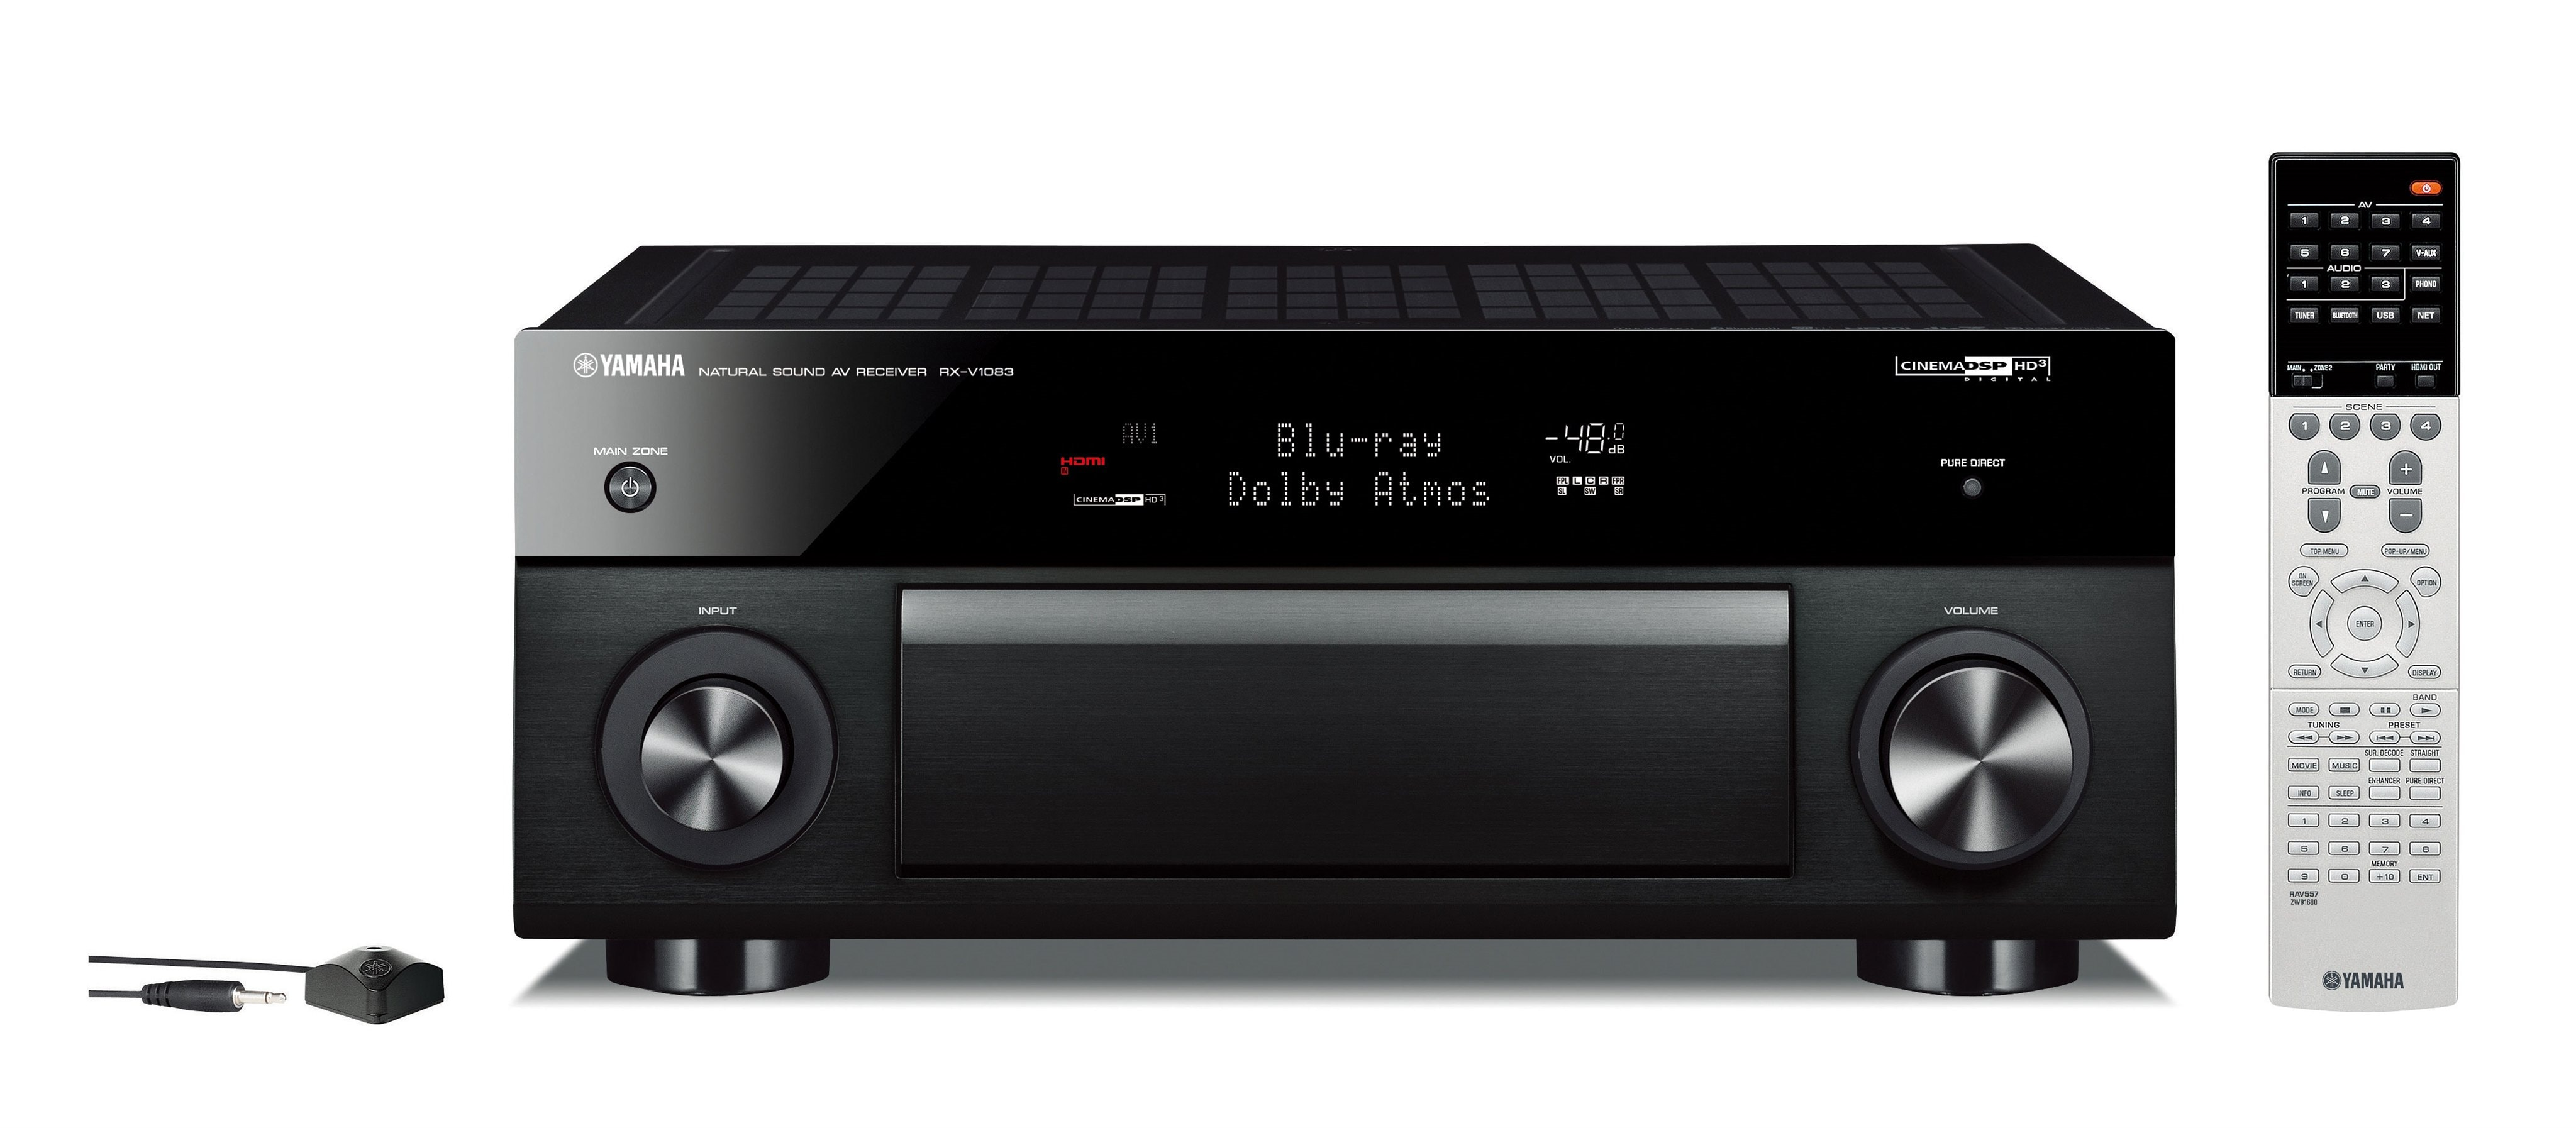 RX-V1083 - Overview - AV Receivers - Audio & Visual